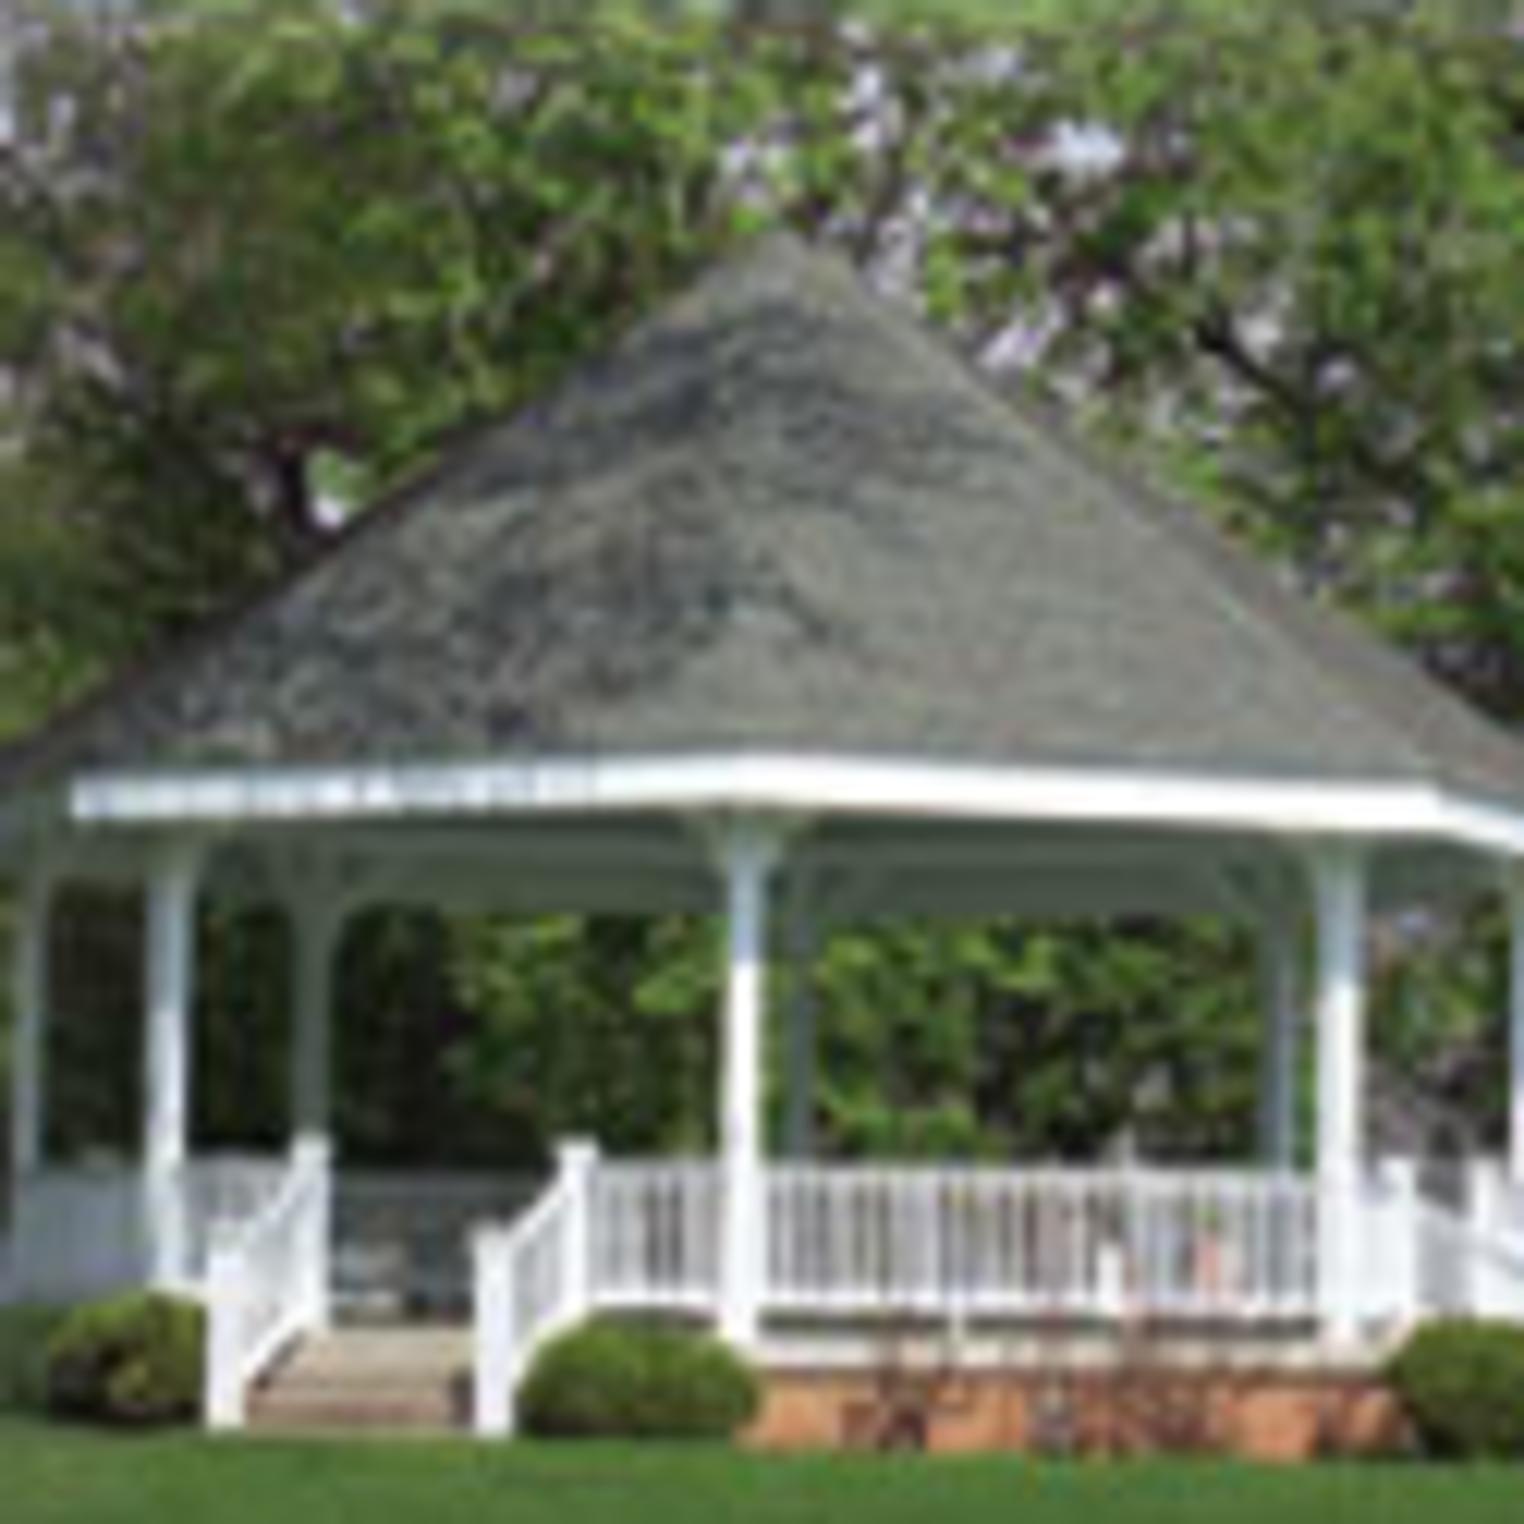 LeTort View Community Center